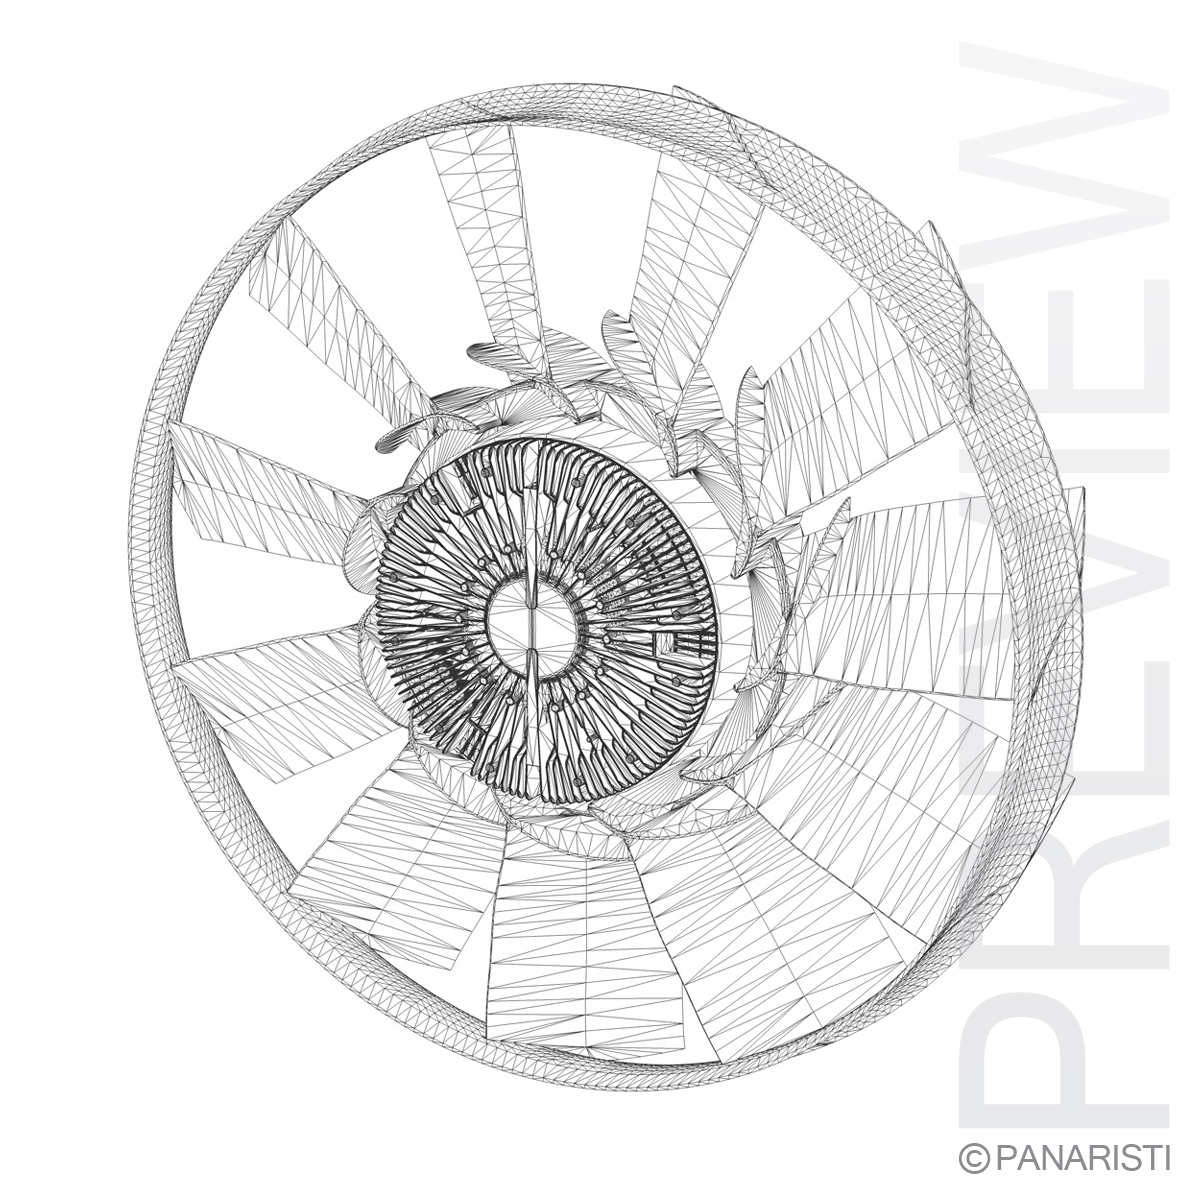 Engine cooling fan 2 3d model 3ds c4d lwo lws lw obj 129283